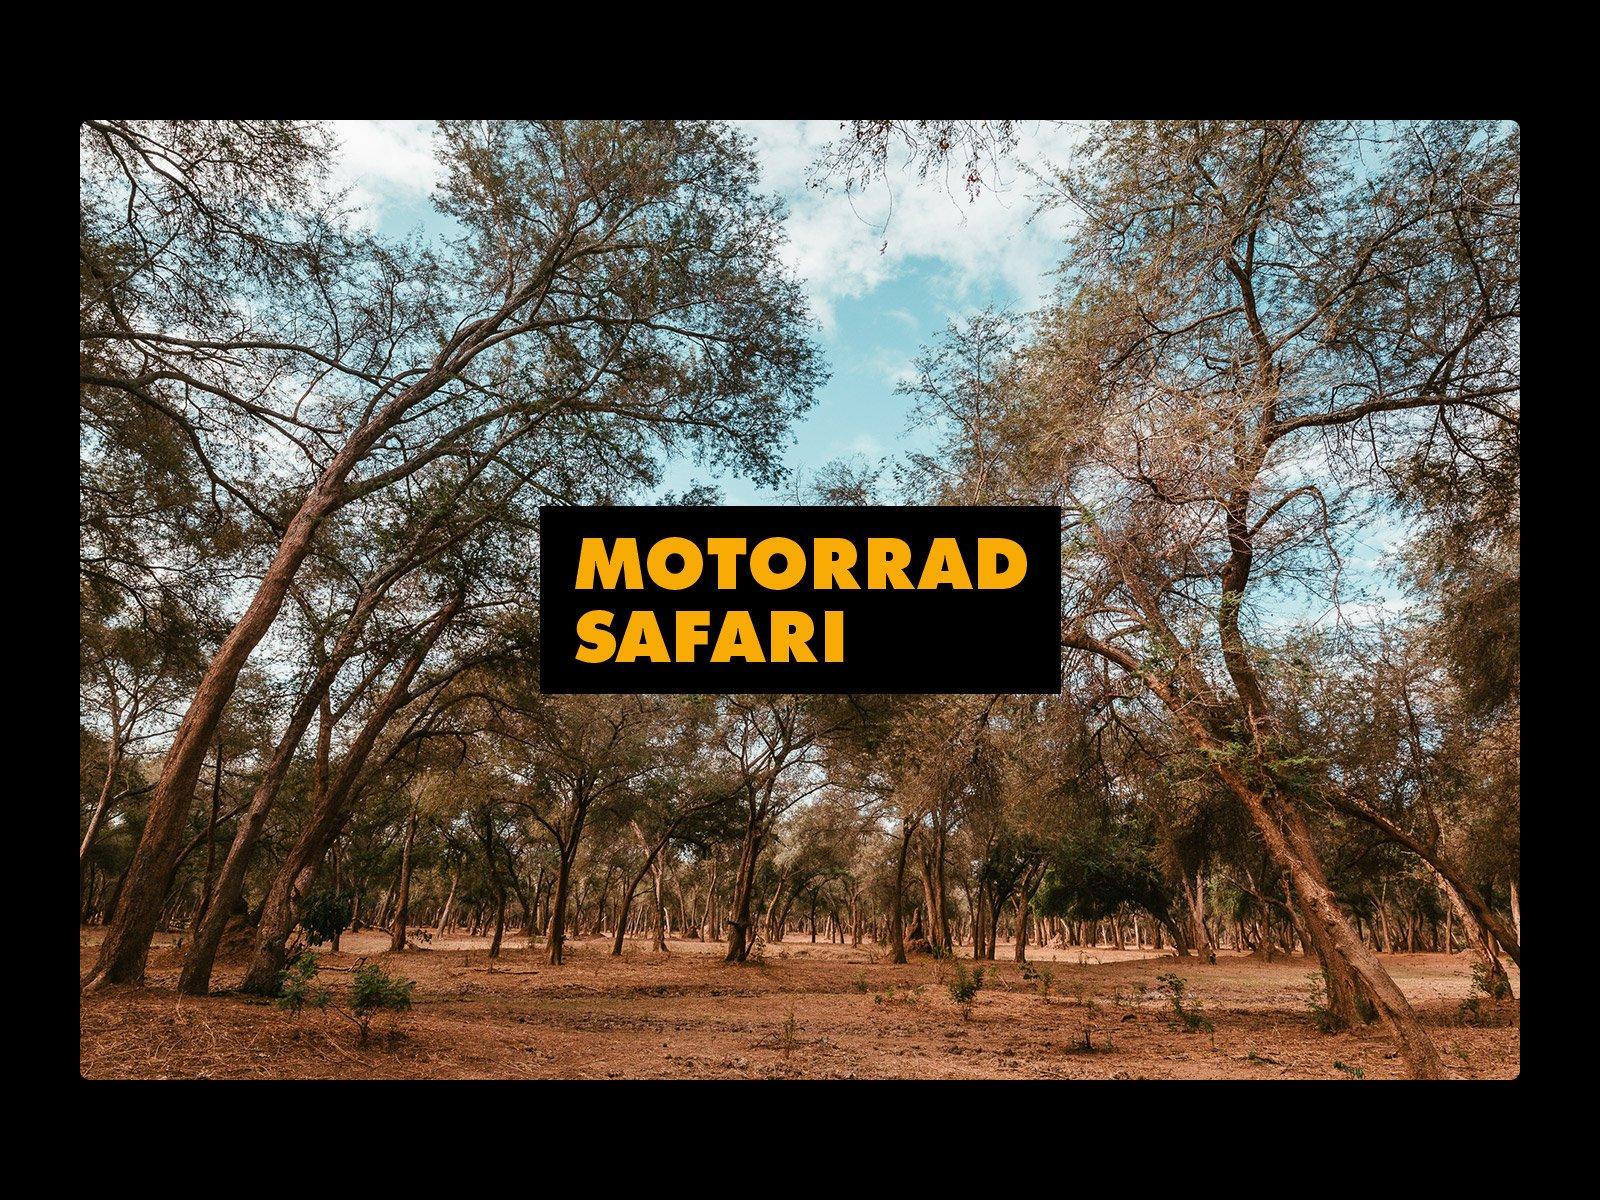 210405 Motorradsafari Project logo